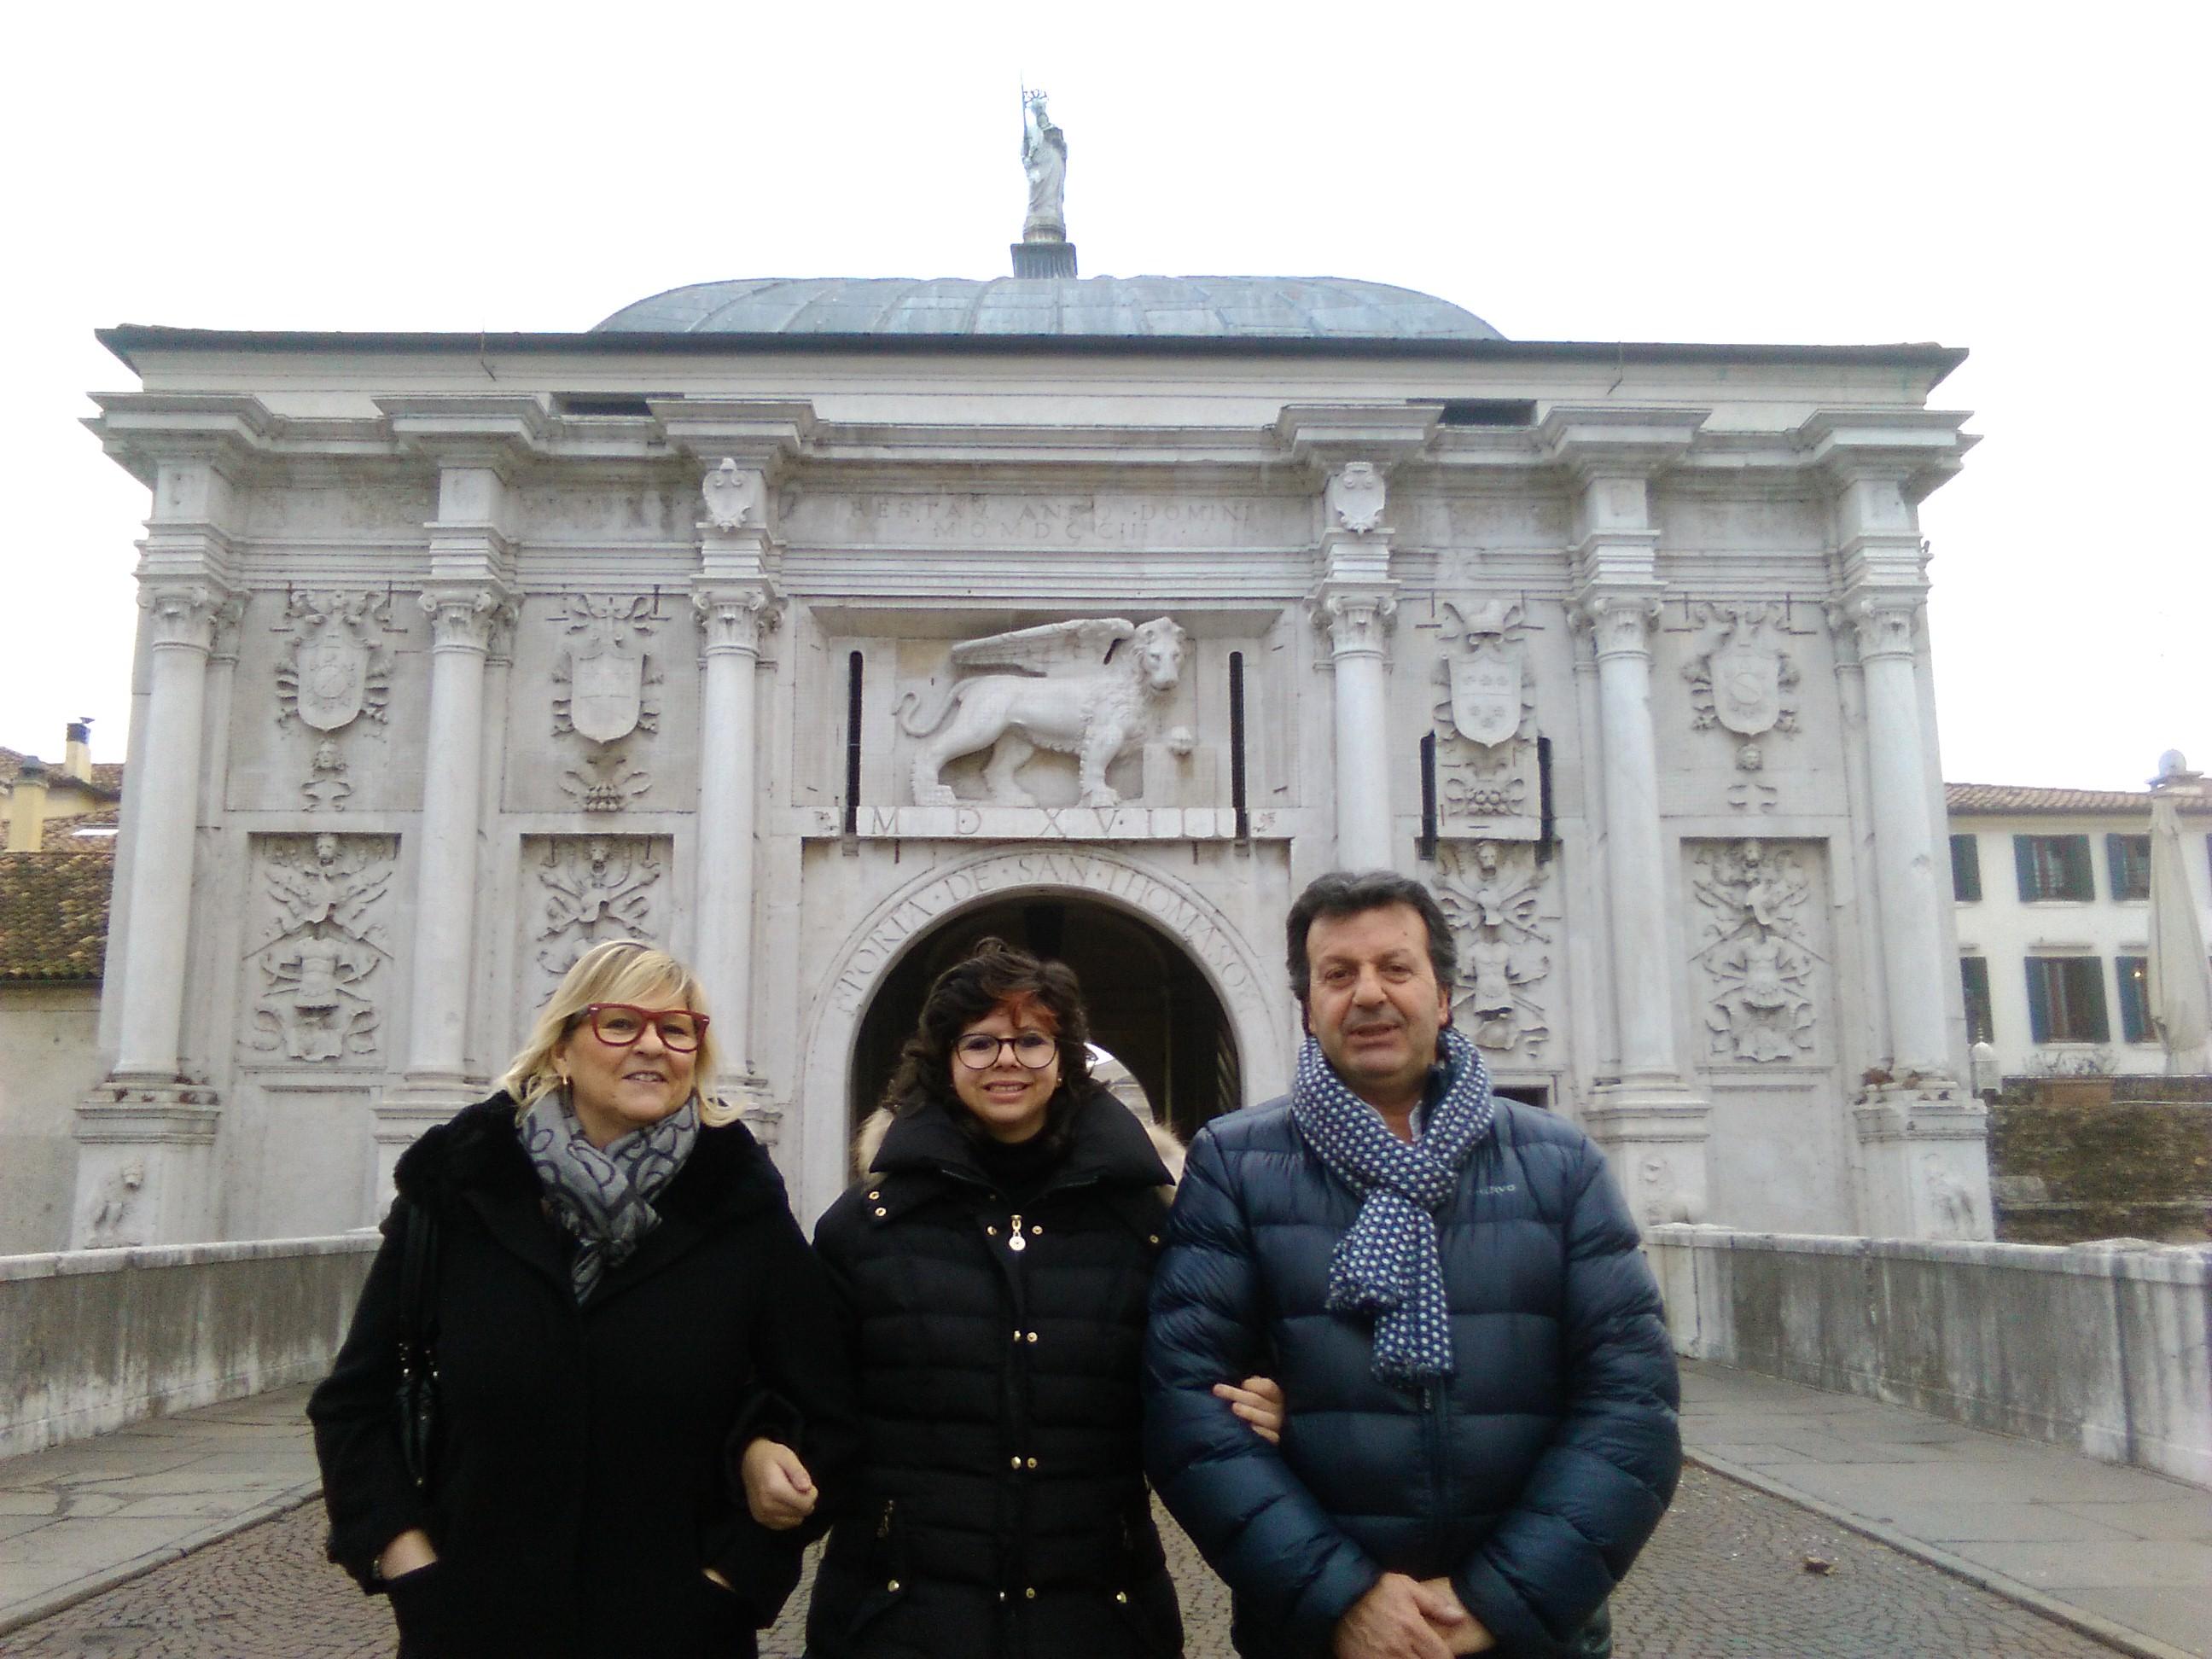 Elisa and her parents